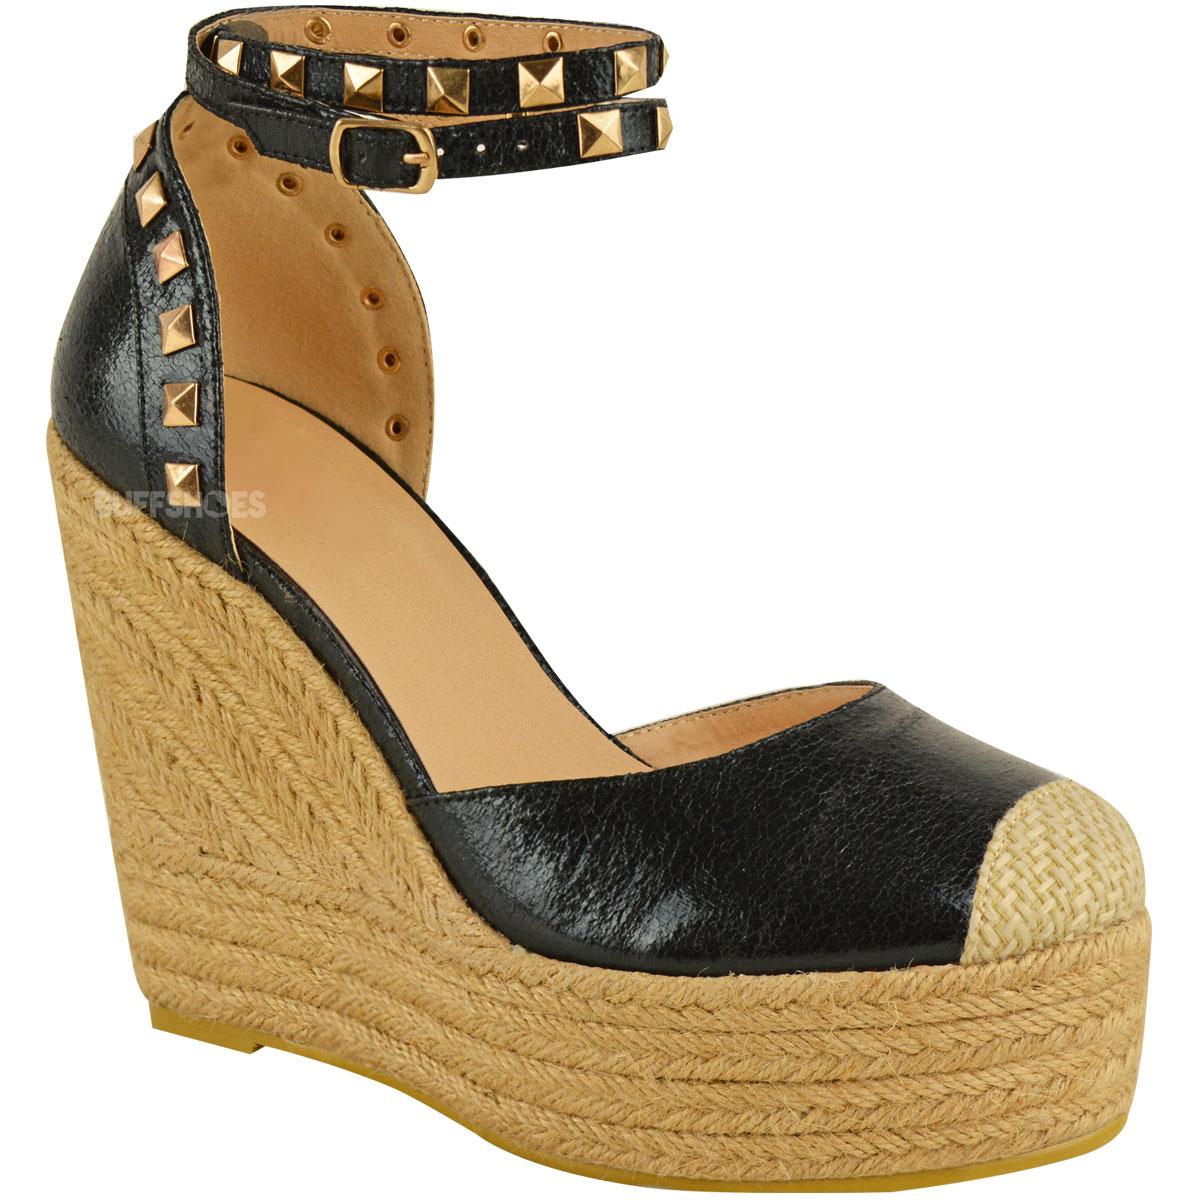 Womens Ladies Stud Espadrille Wedge Summer Sandal Platform ...